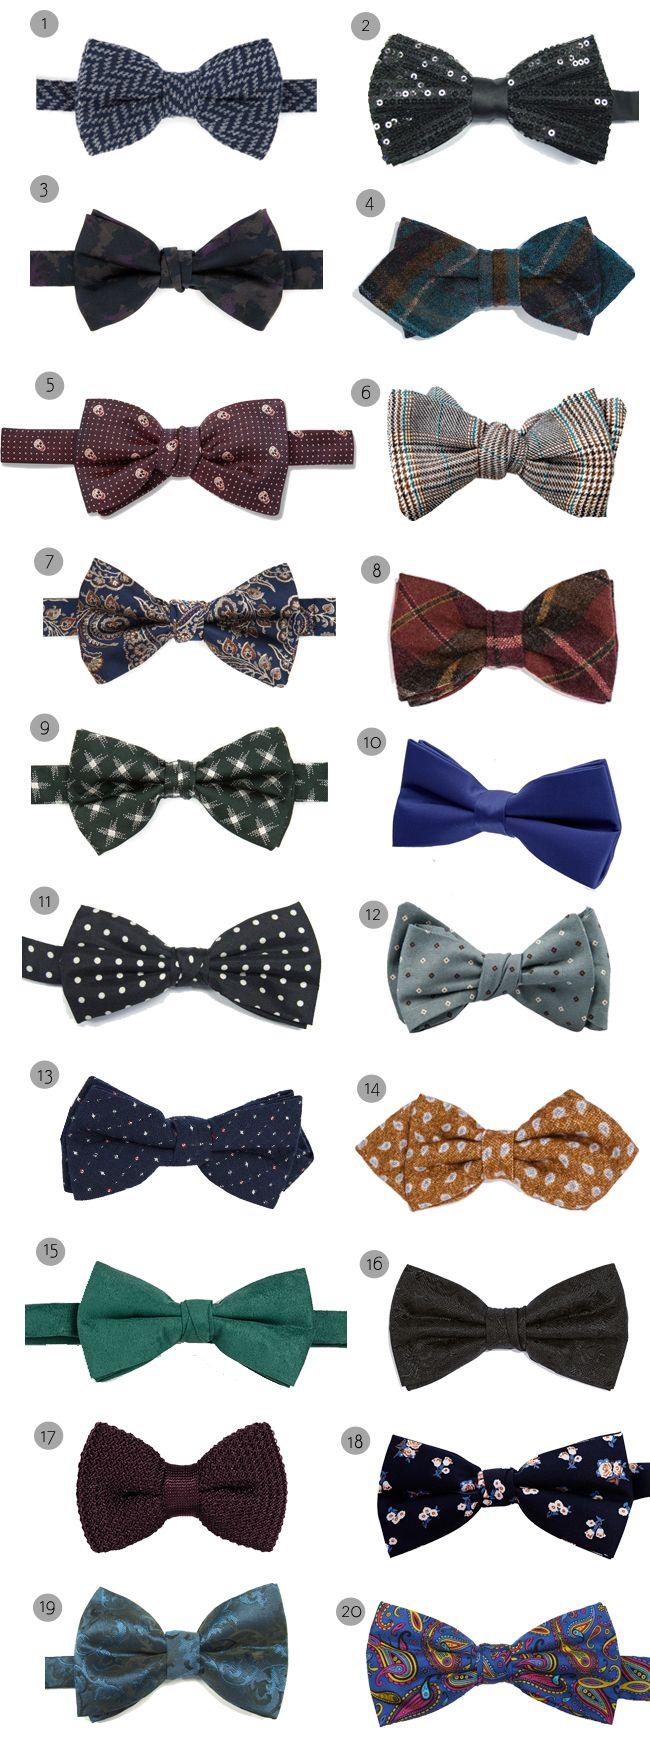 Groom Style: Bow Ties for the Boys | weddingsonline